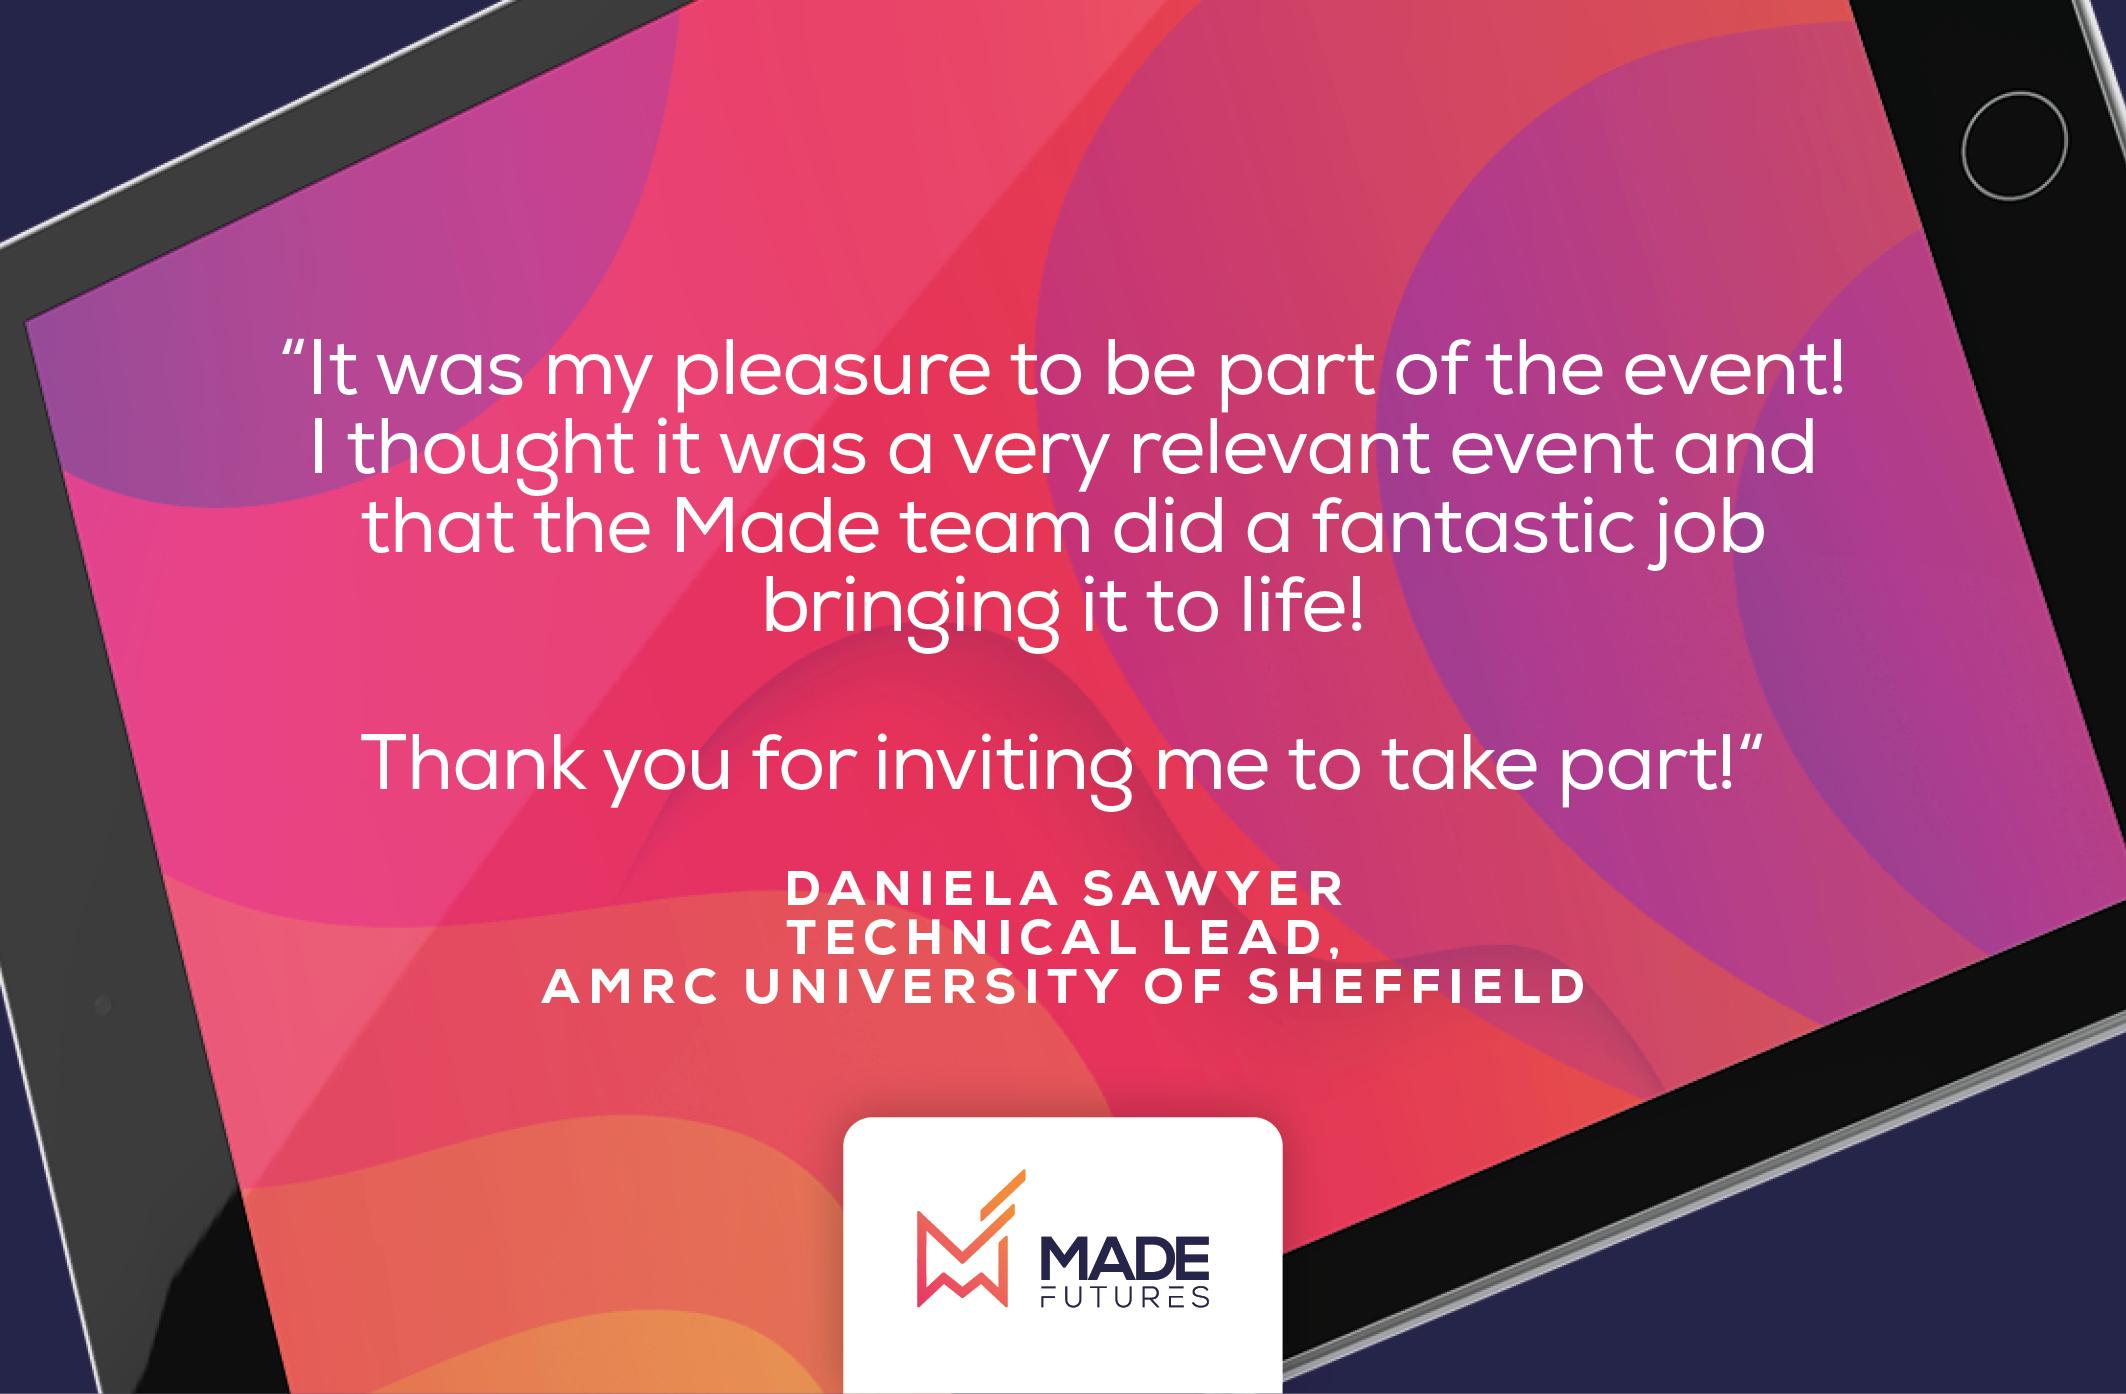 Testimonial by Daniela Sawyer, Technical lead at AMRC University of Sheffield